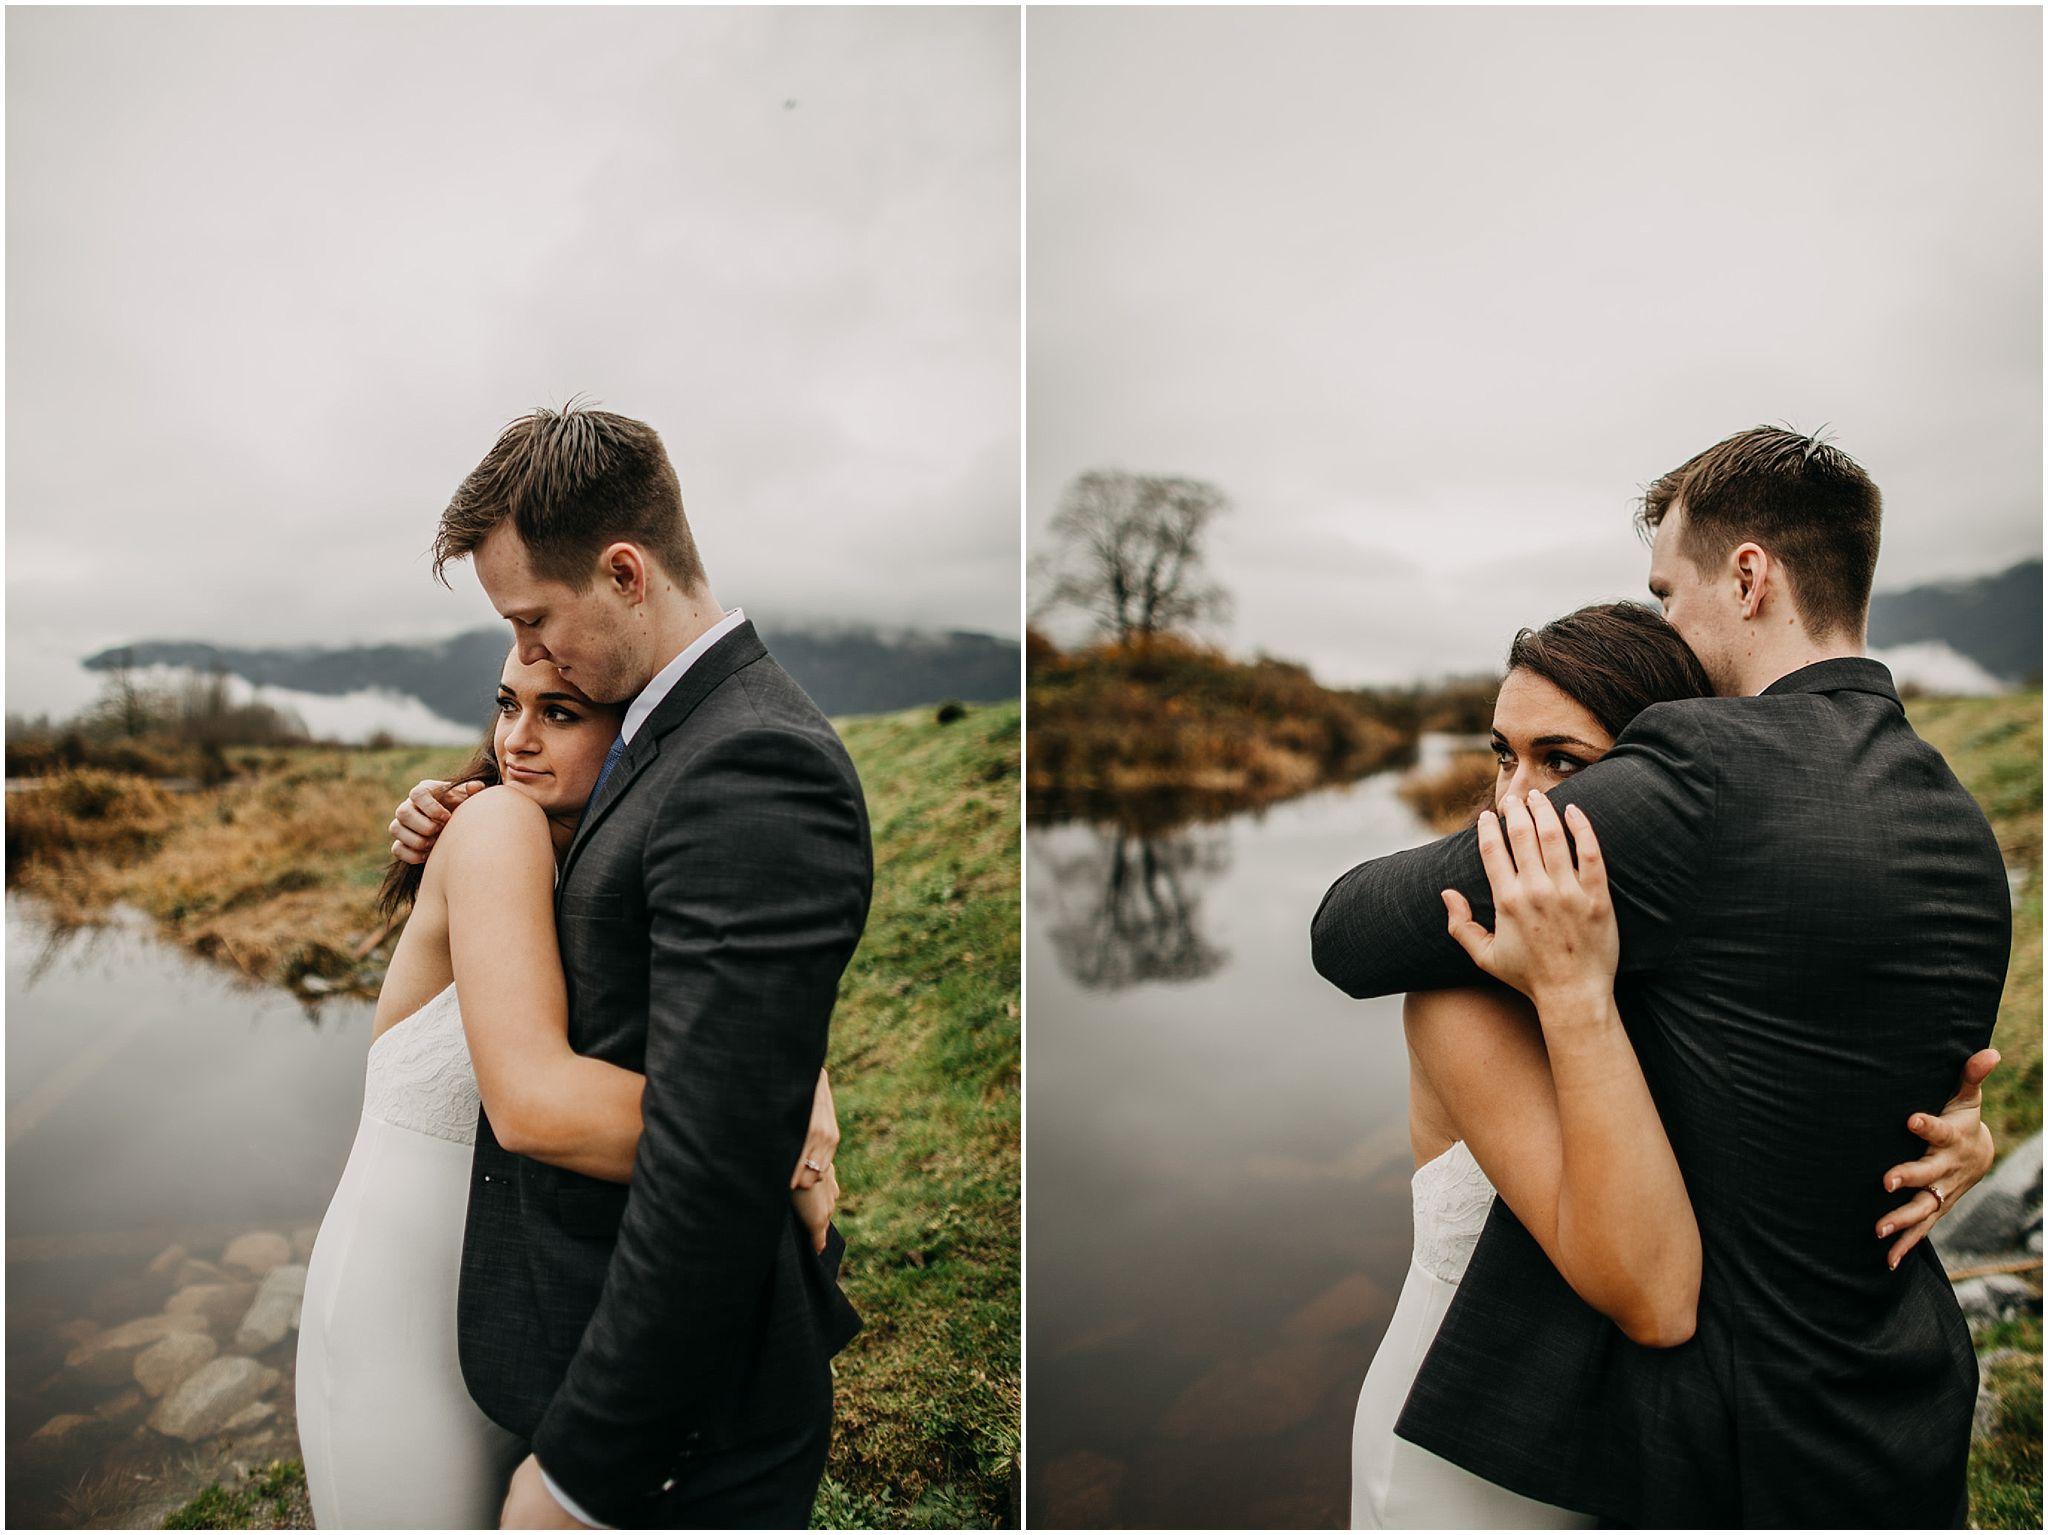 couple bear hug engagement pitt lake intimate moment